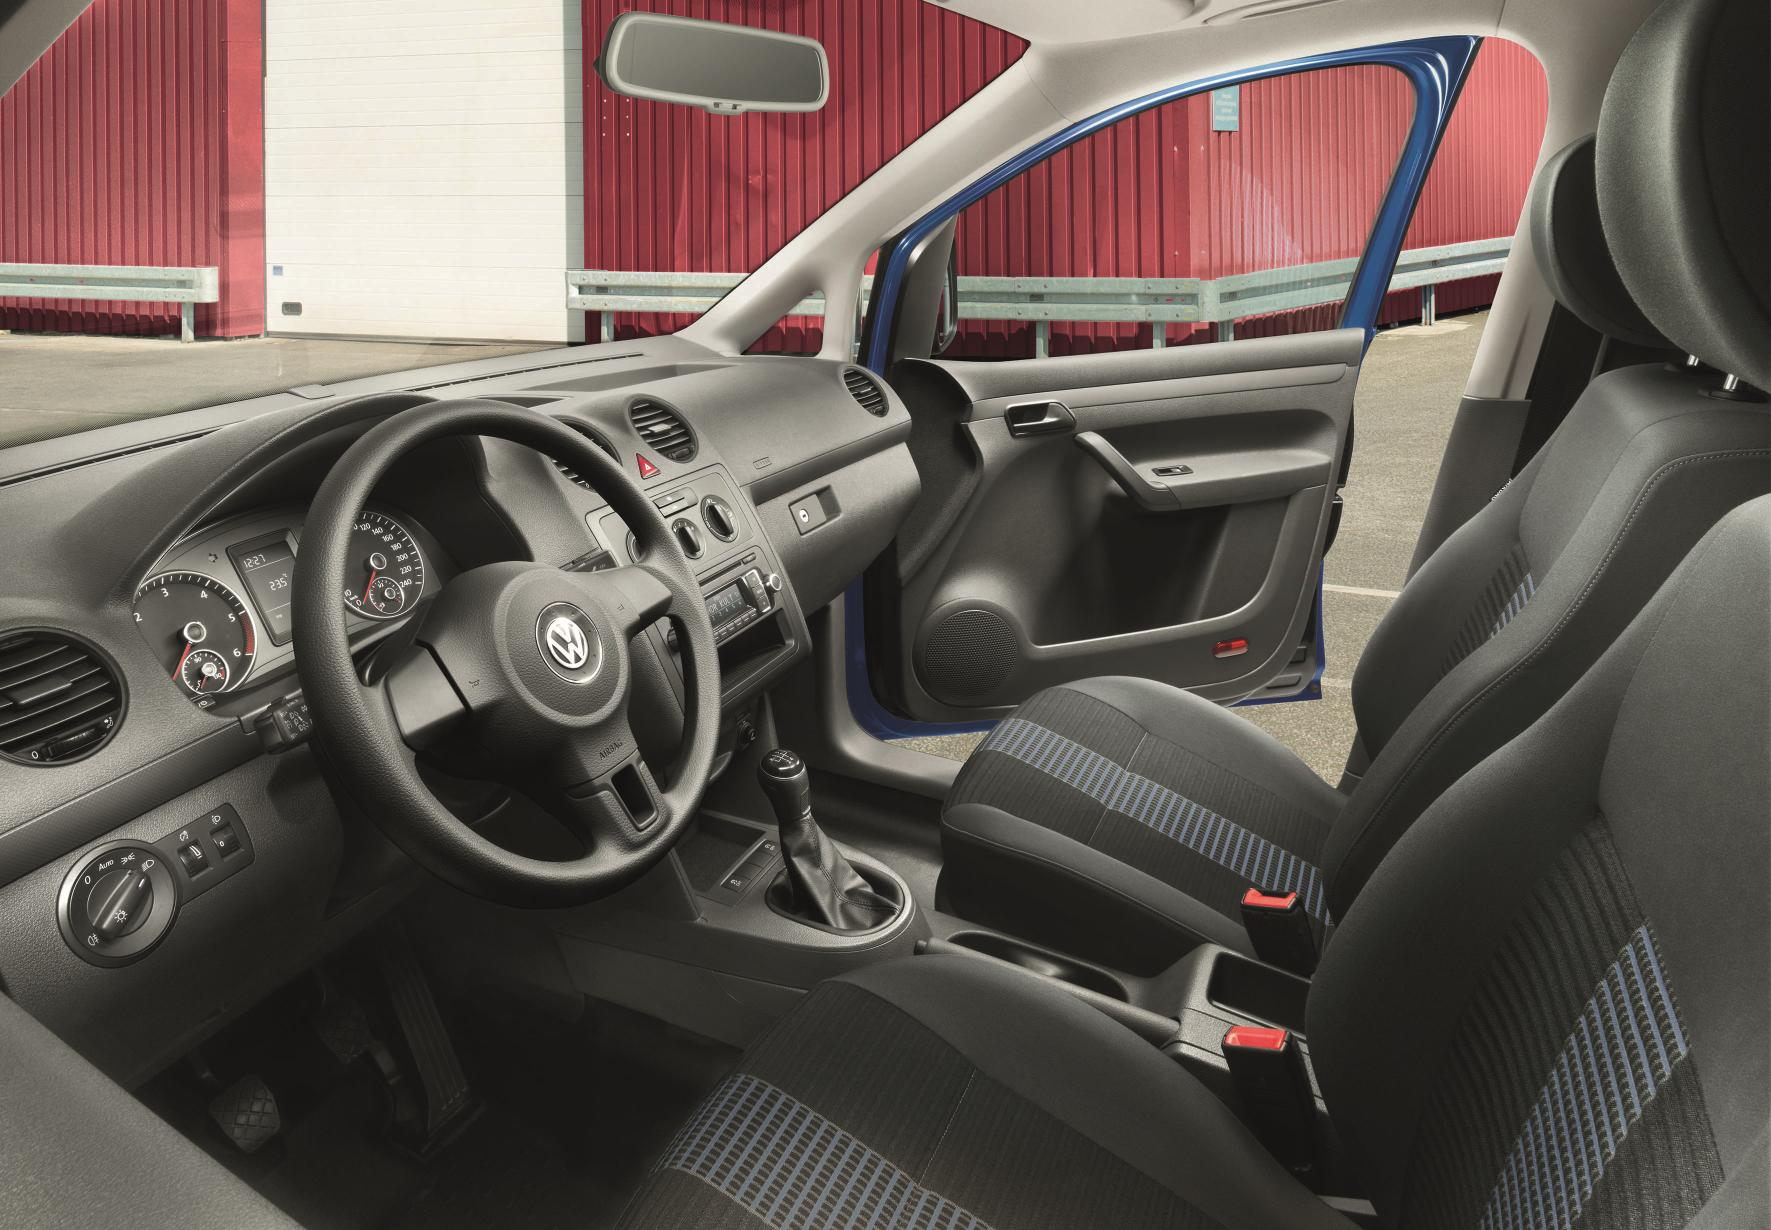 Volkswagen Caddy Commercialvehicle Com